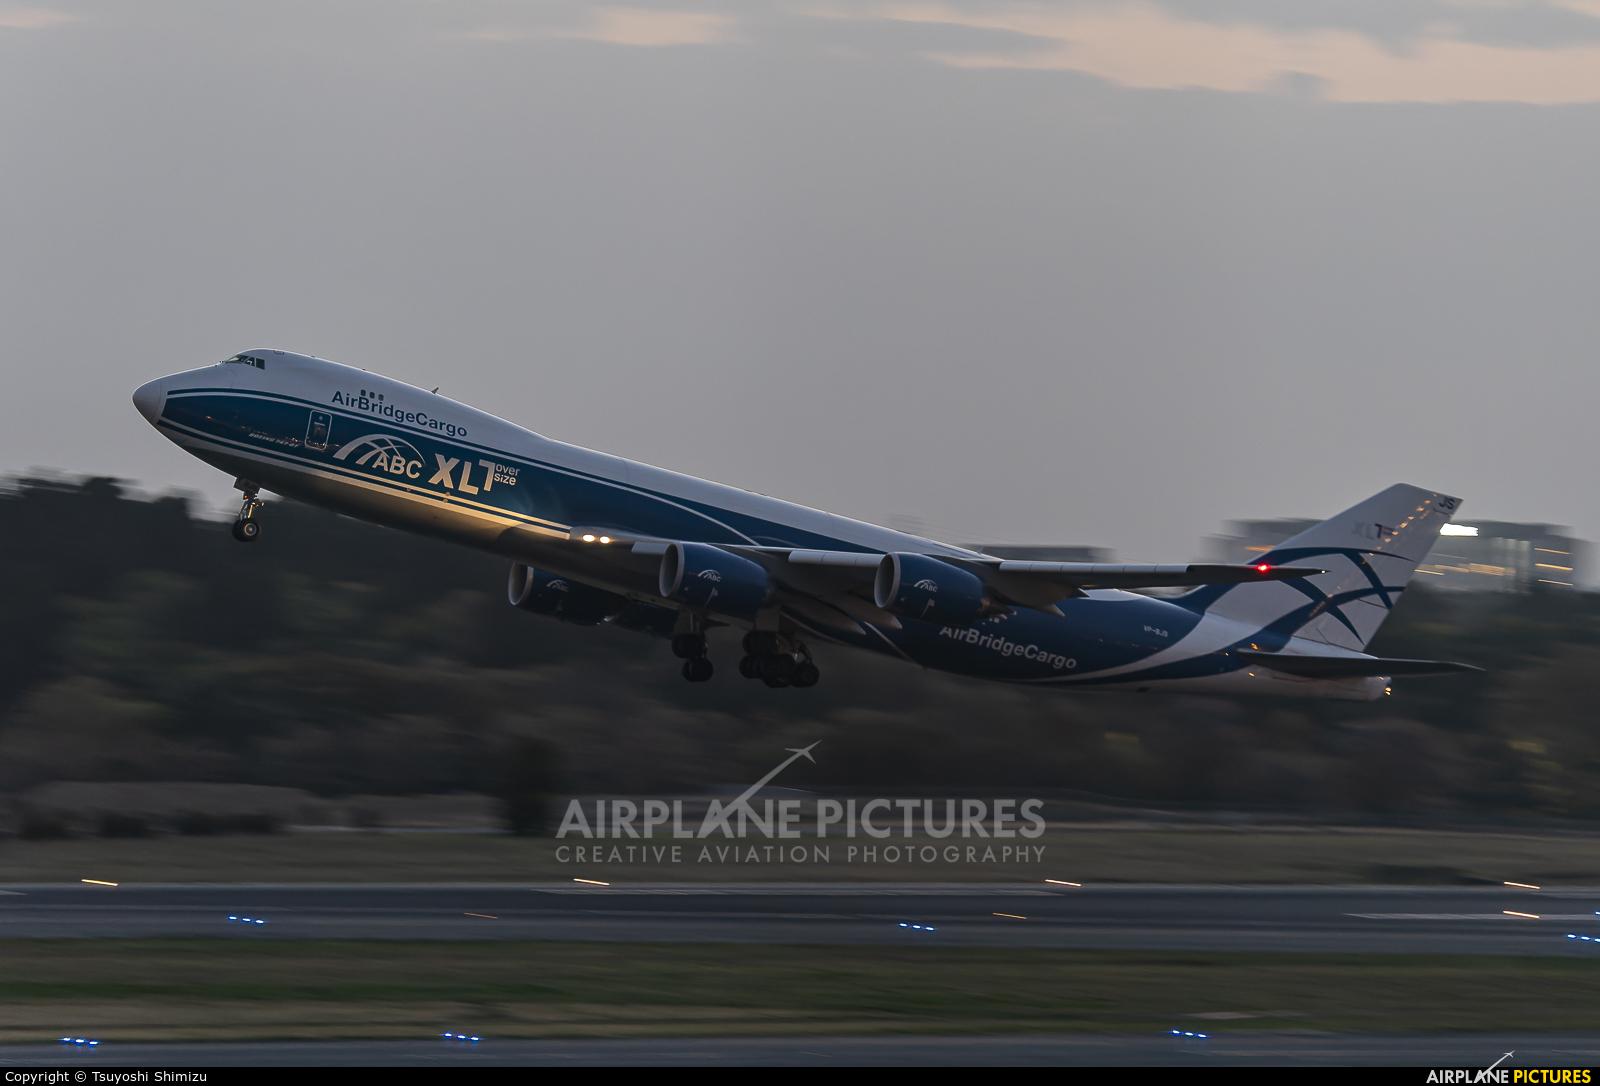 Air Bridge Cargo VP-BJS aircraft at Tokyo - Narita Intl